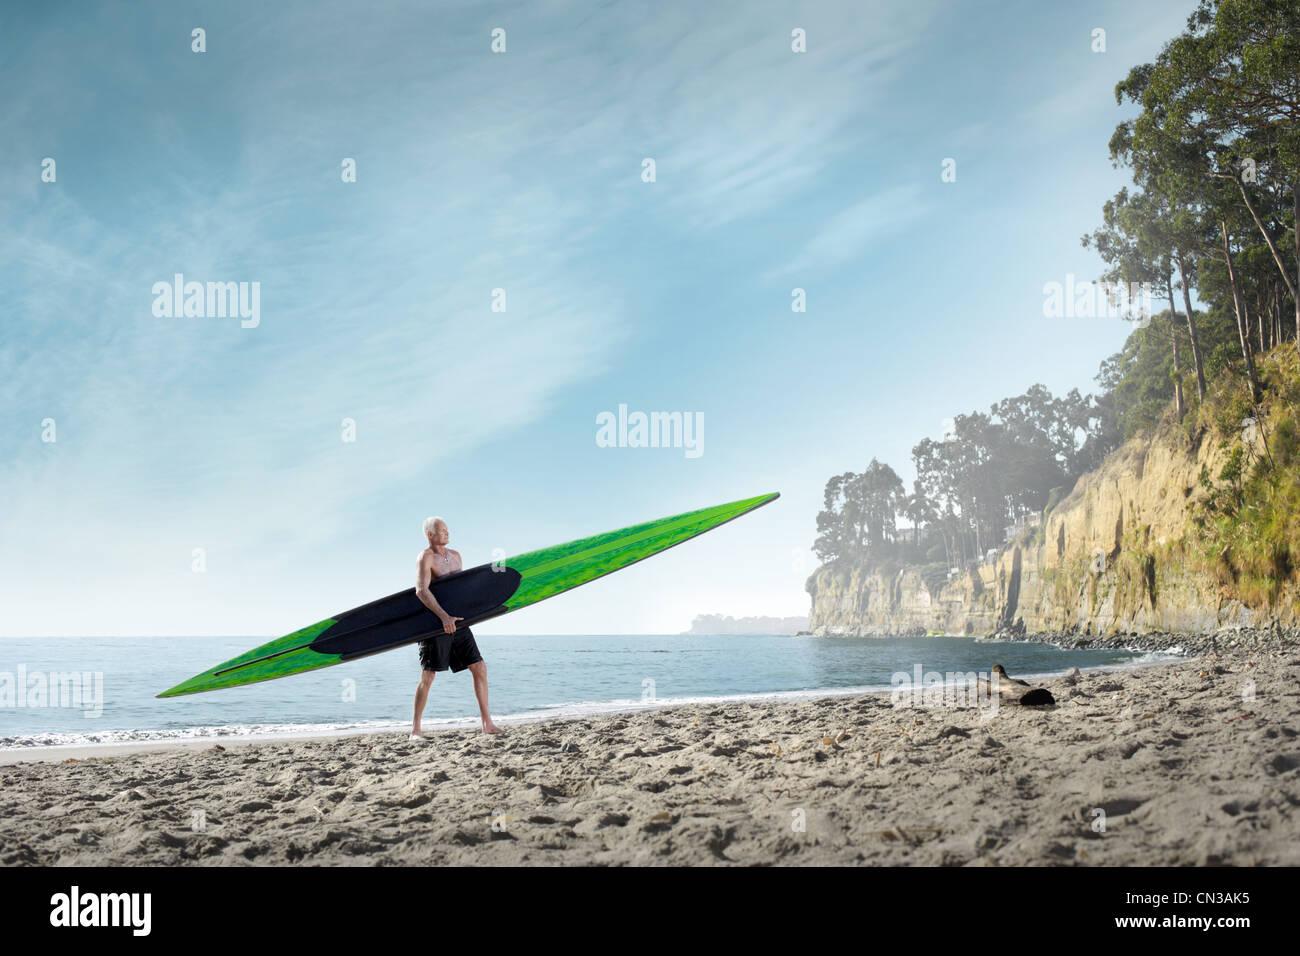 Surfer mit Surfbrett an Strand, Santa Cruz, Kalifornien, USA Stockbild